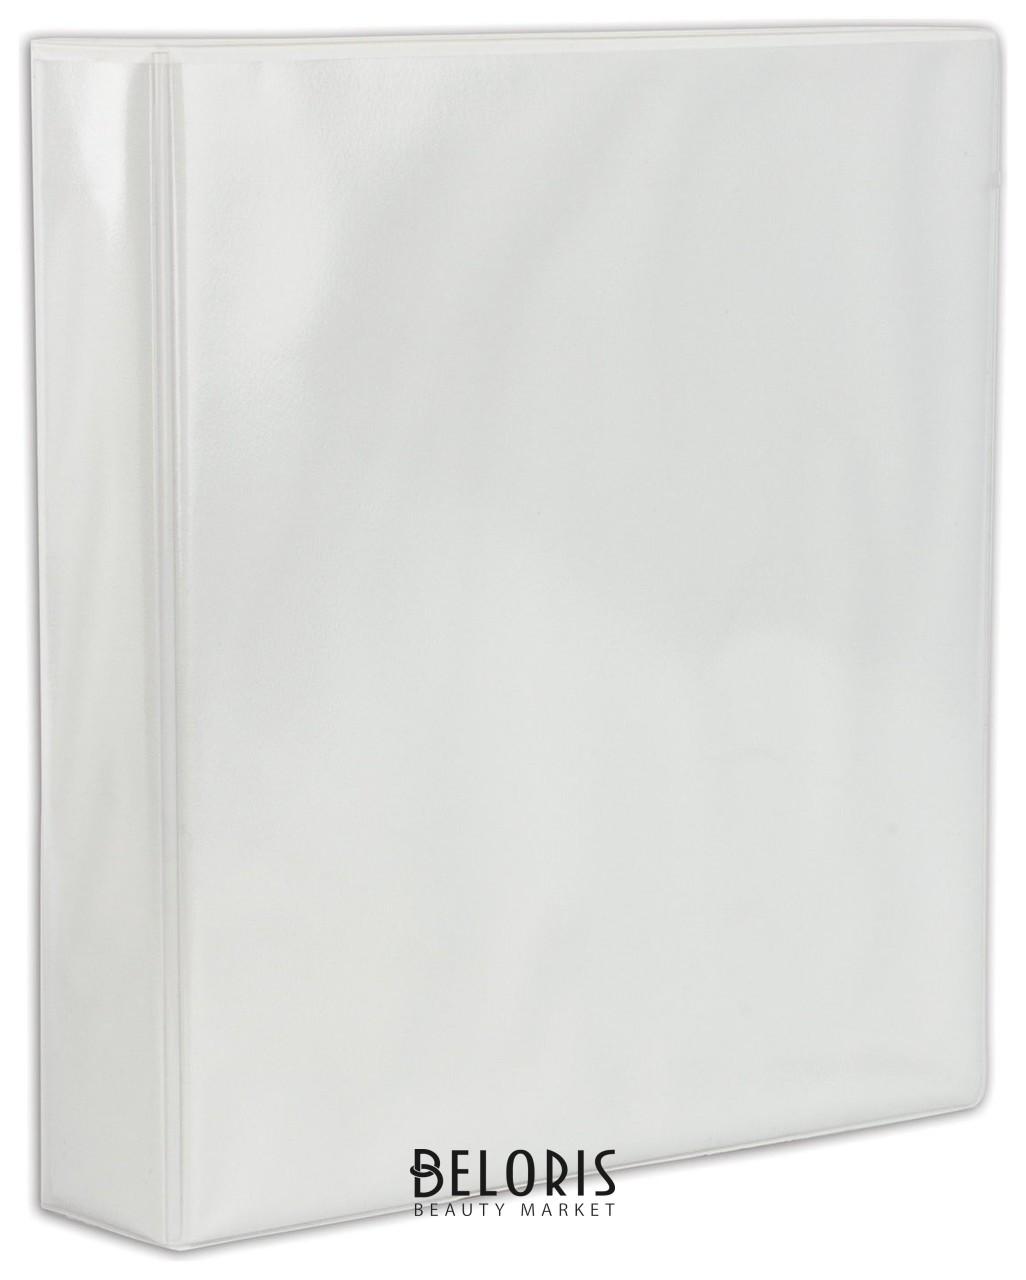 Папка на 4 кольцах с передним прозрачным карманом, 65 мм, картон/ПВХ, белая, до 400 листов Brauberg